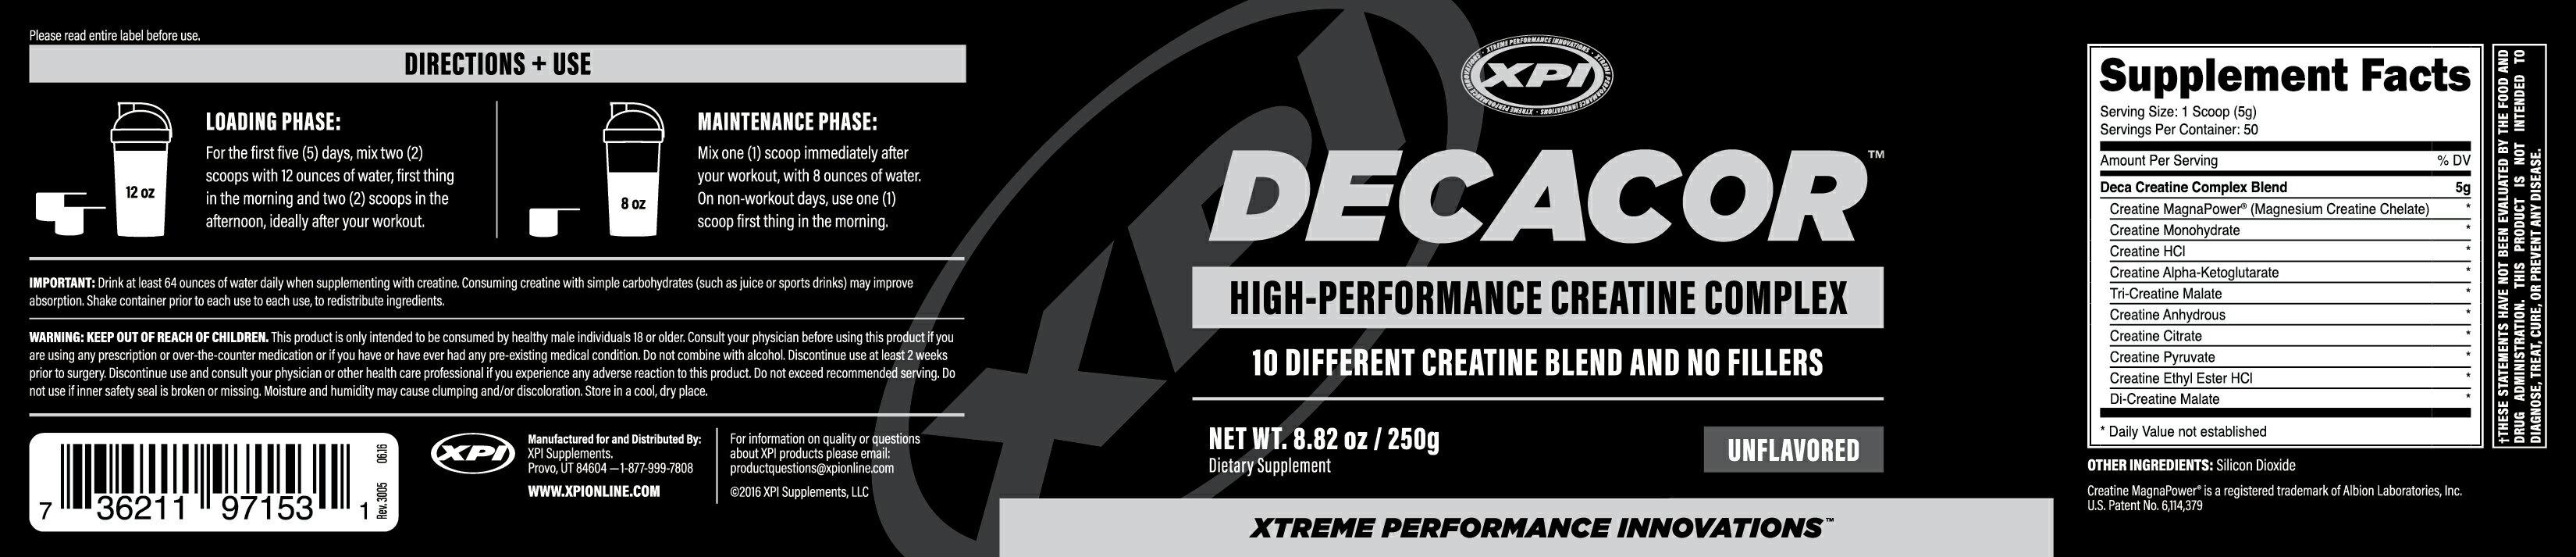 XPI Decacor Creatine - Best Creatine Powder - Uses 10 Different Forms of  Creatine 2